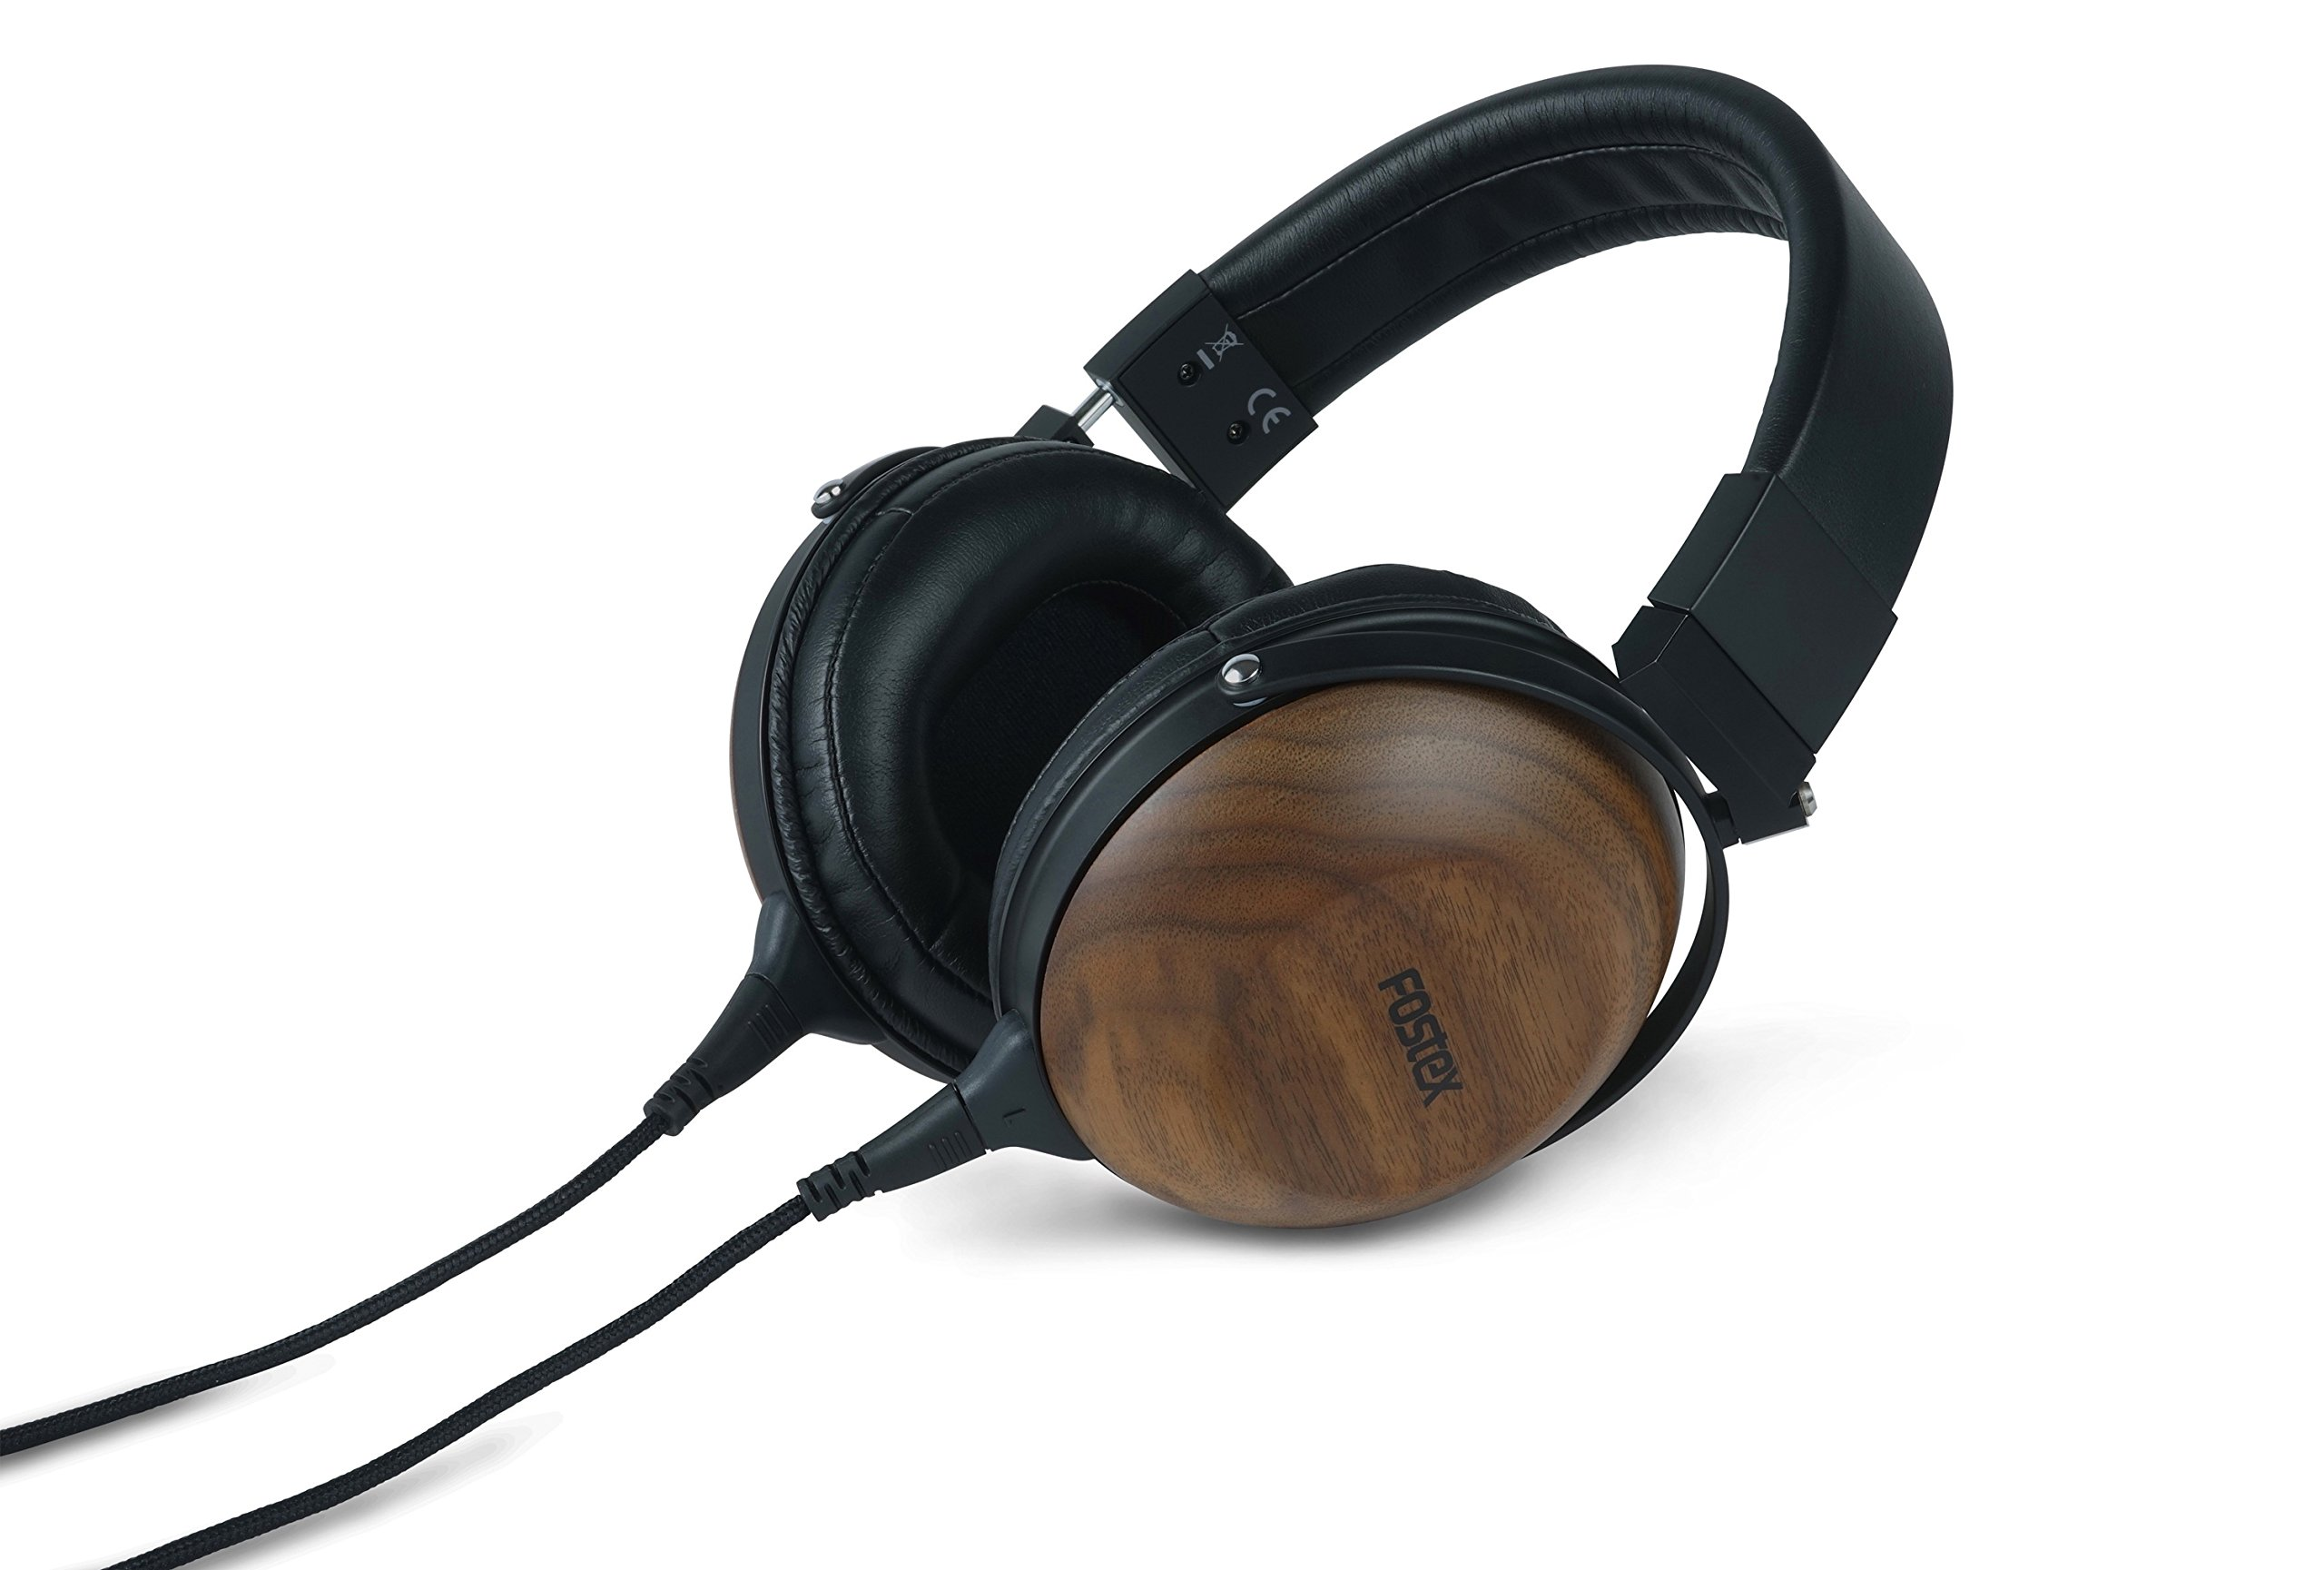 Fostex TH610 Premium Stereo Headphones with Tesla Magnetic Circuit, Black/Walnut